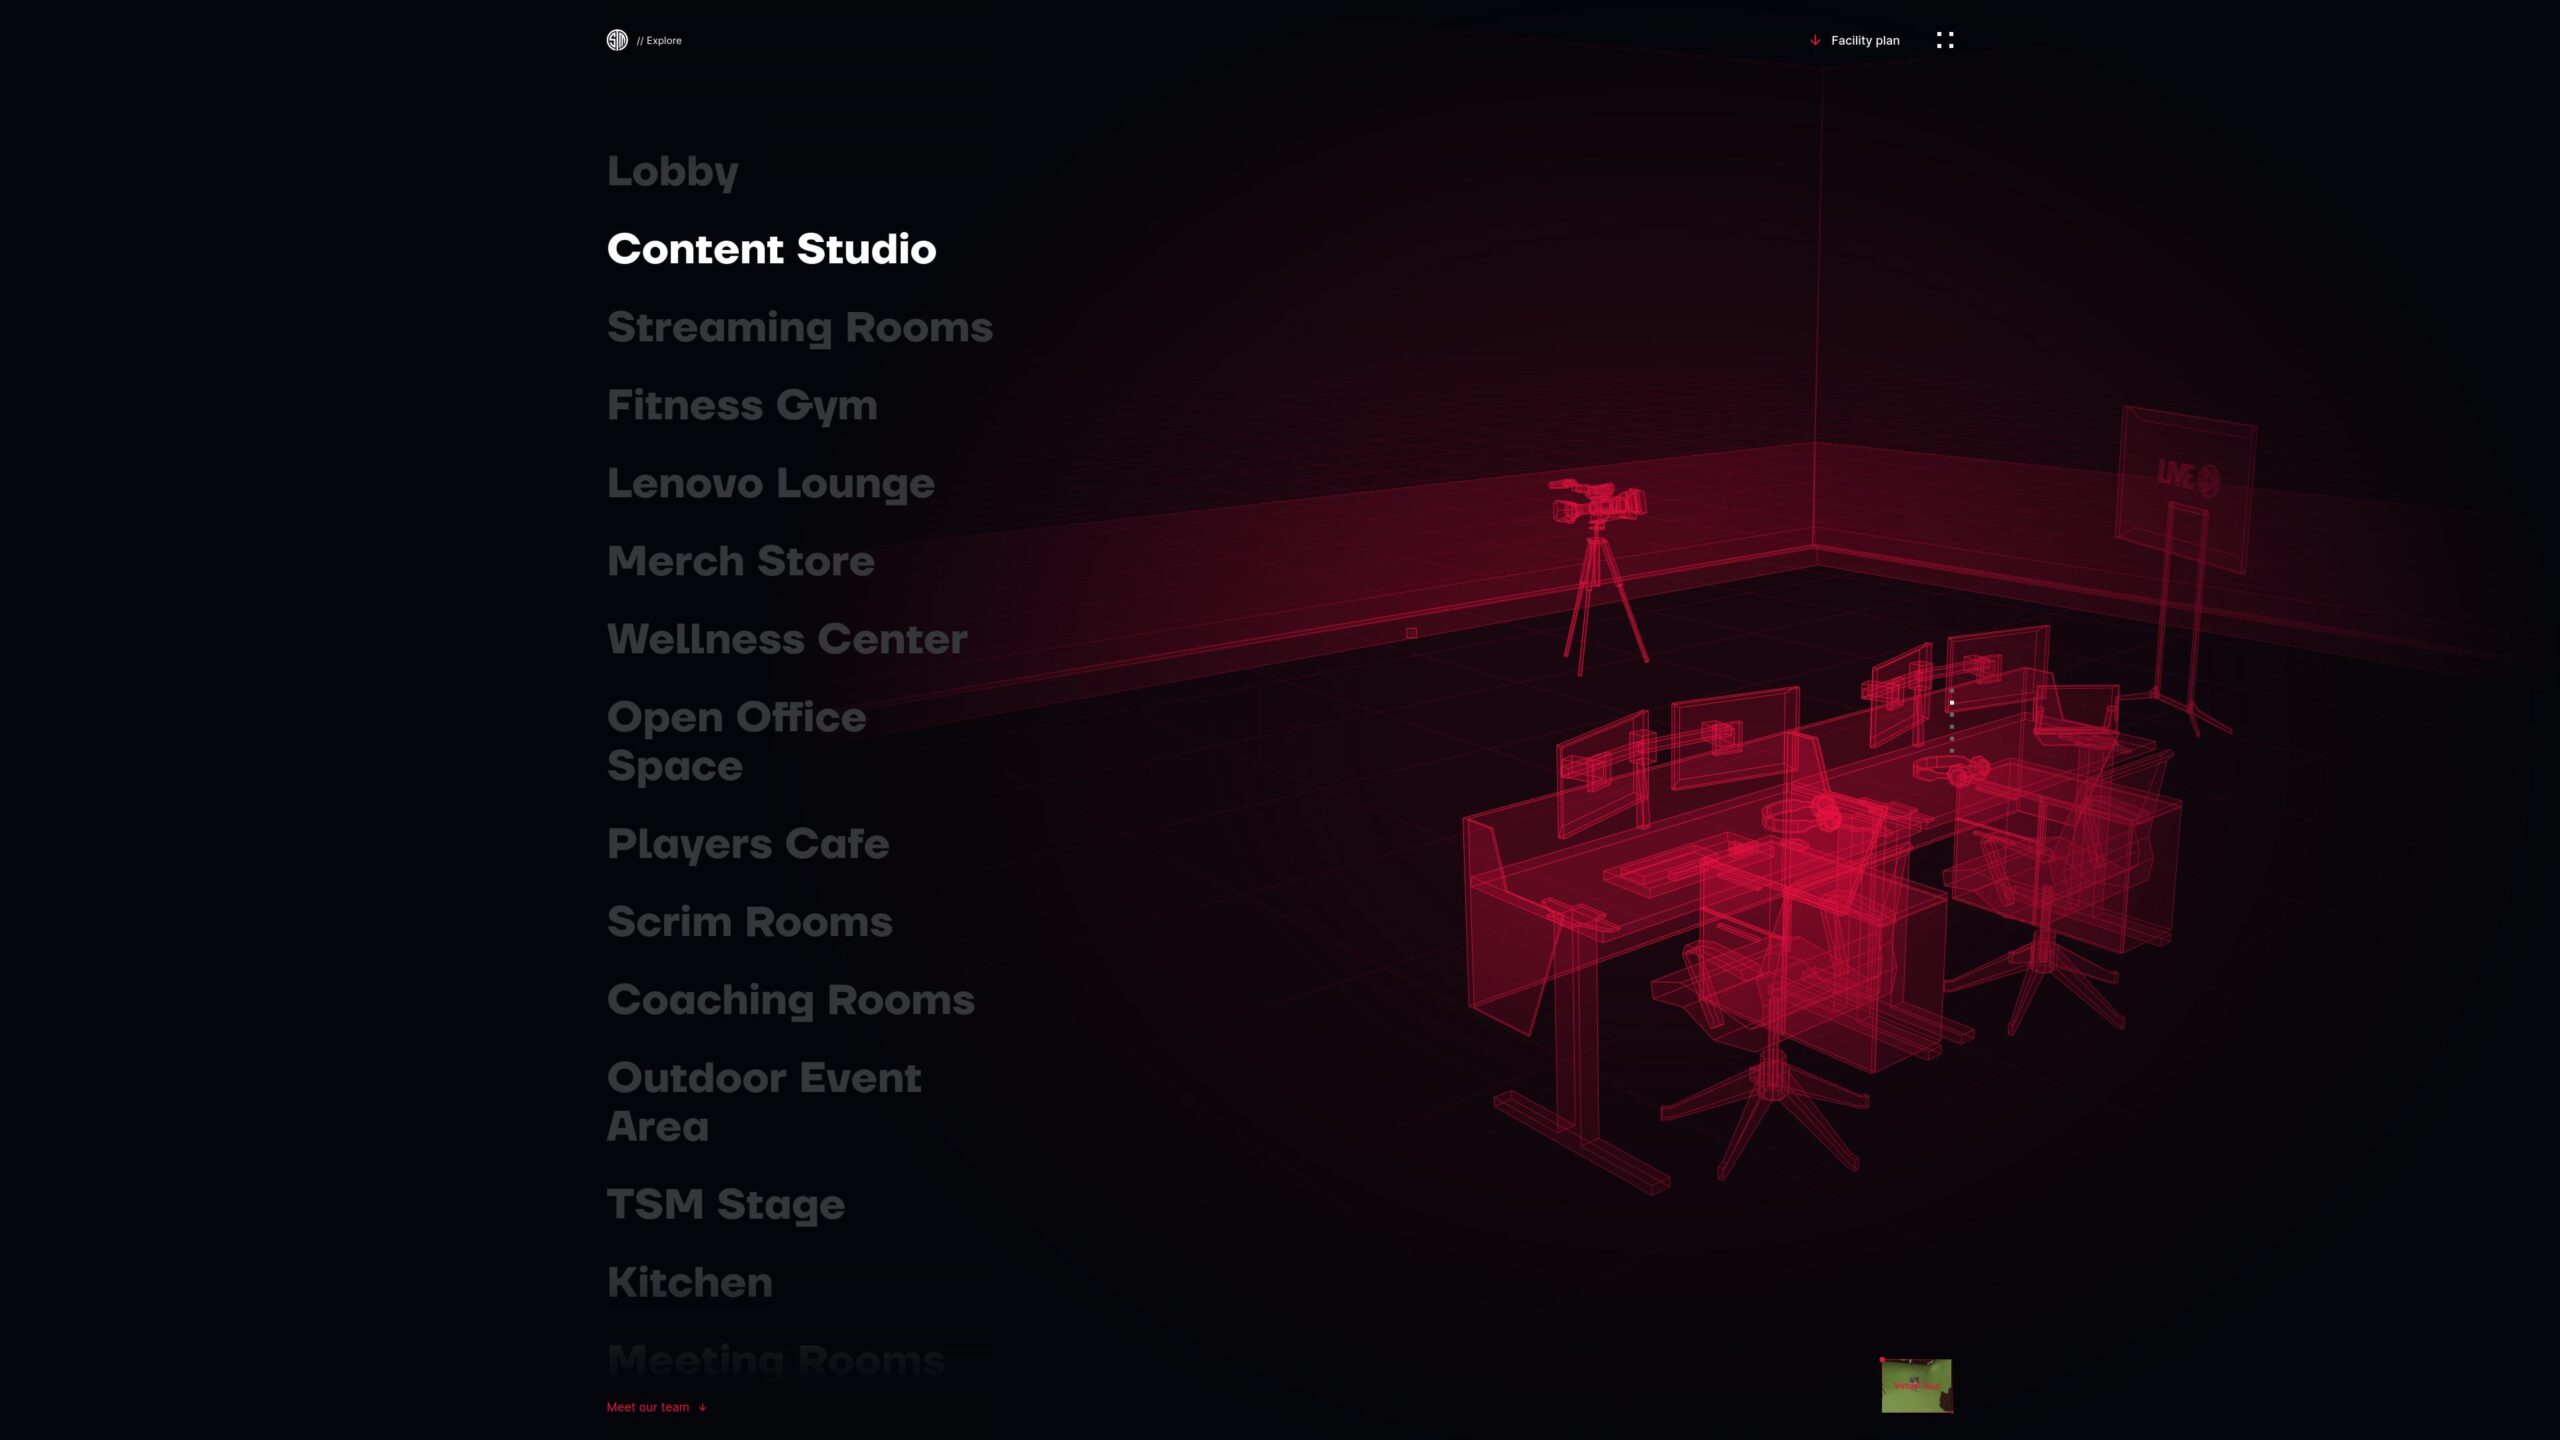 Orpetron Web Design Awards - Team Solomid Esports Facility - Web Design Awards Inspiration Trends UI UX